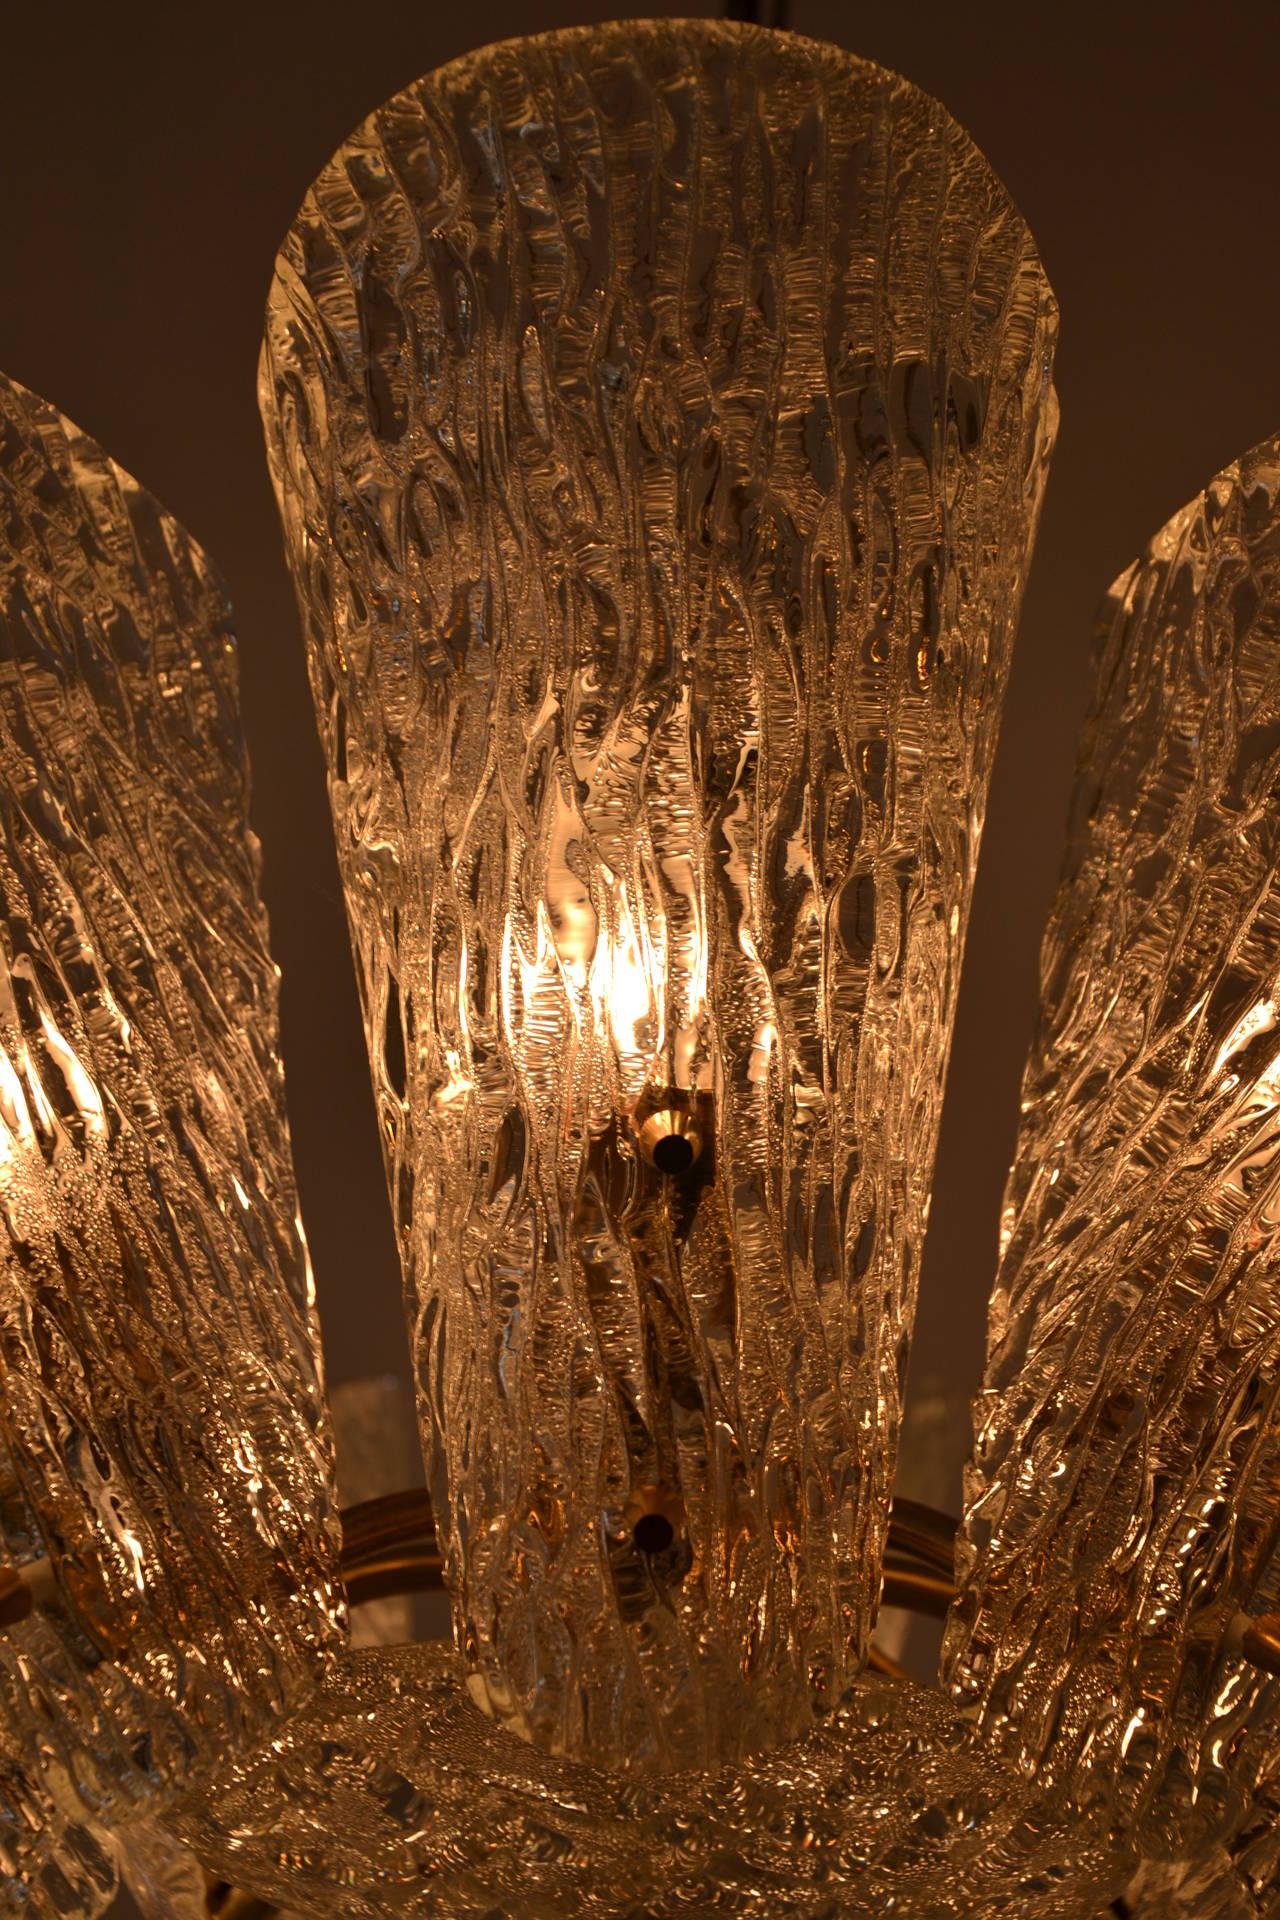 Kalmar Vienna Brass Chandelier with White Textured Glass Lamp Shades In Excellent Condition For Sale In Wien, AT